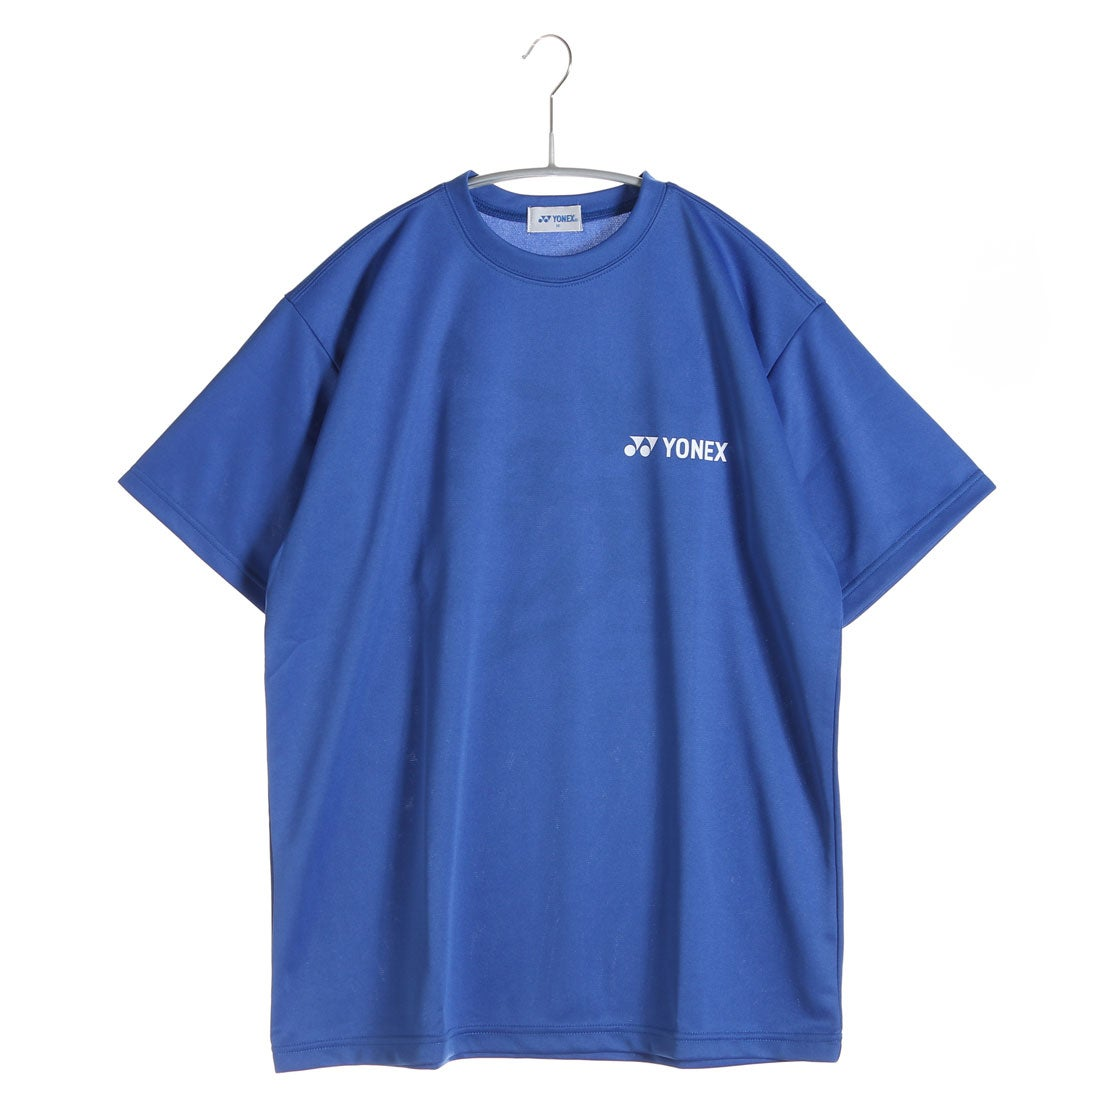 23707cb6c04ec ヨネックス YONEX テニスTシャツ ドライTシャツ RWAP1602 ブルー (ディープブル?) -レディースファッション通販  ロコンドガールズコレクション (LOCONDO GIRL'S ...